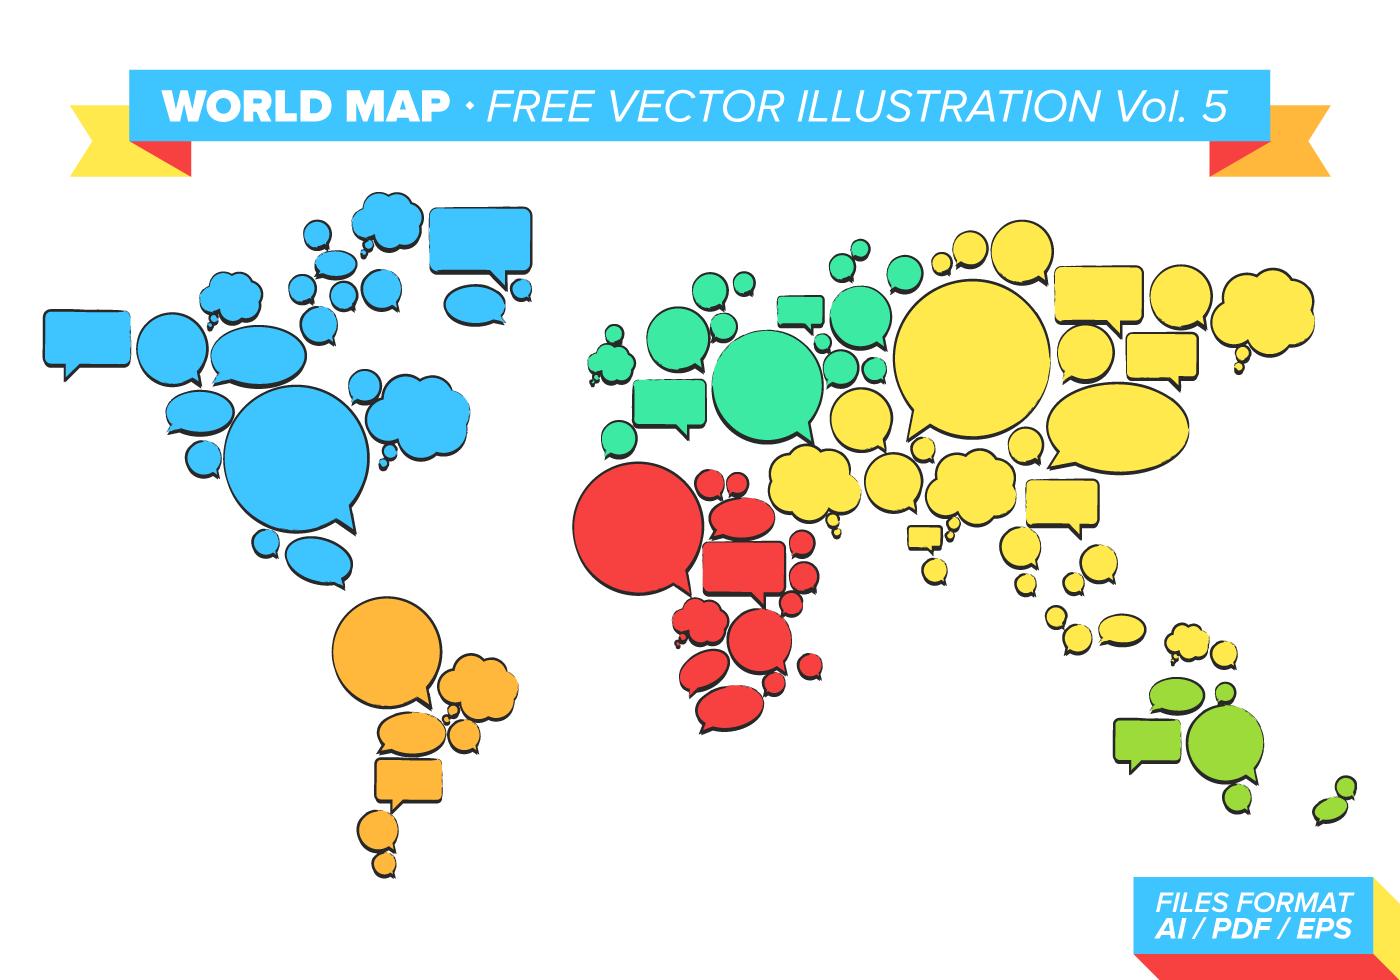 World Map Free Vector Illustration Vol 5 Download Free Vector Art Stock G